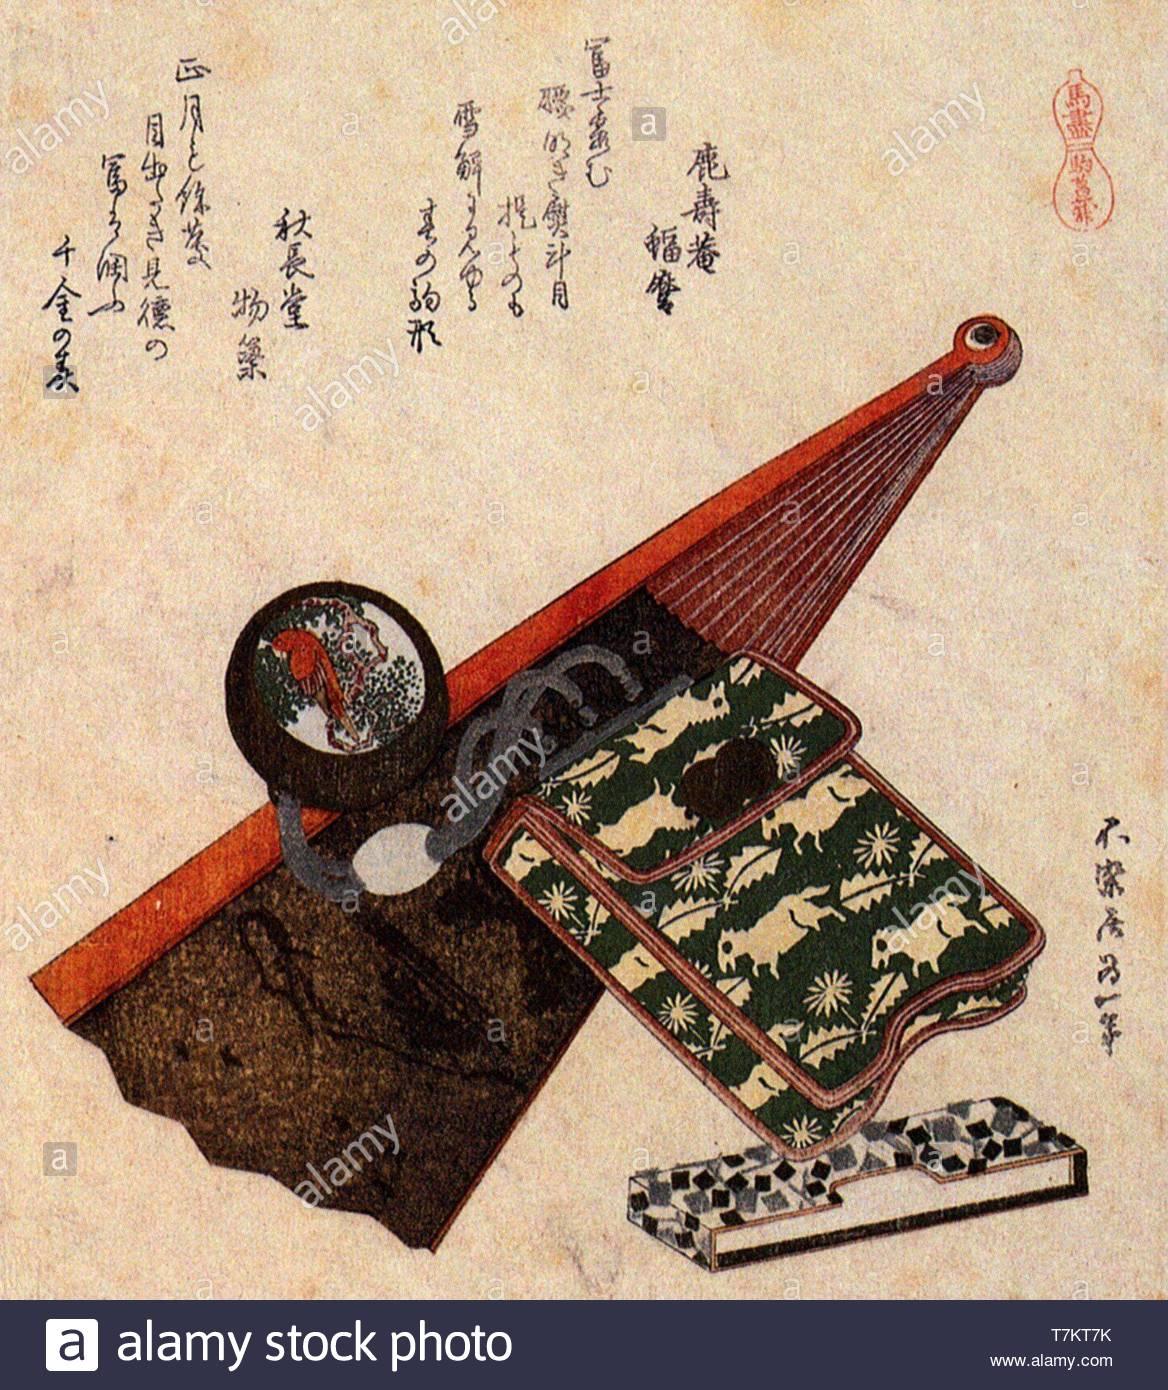 Katsushika-Hokusai-A leather Pouch with kagami Netsuke ona partly opened fan - Stock Image